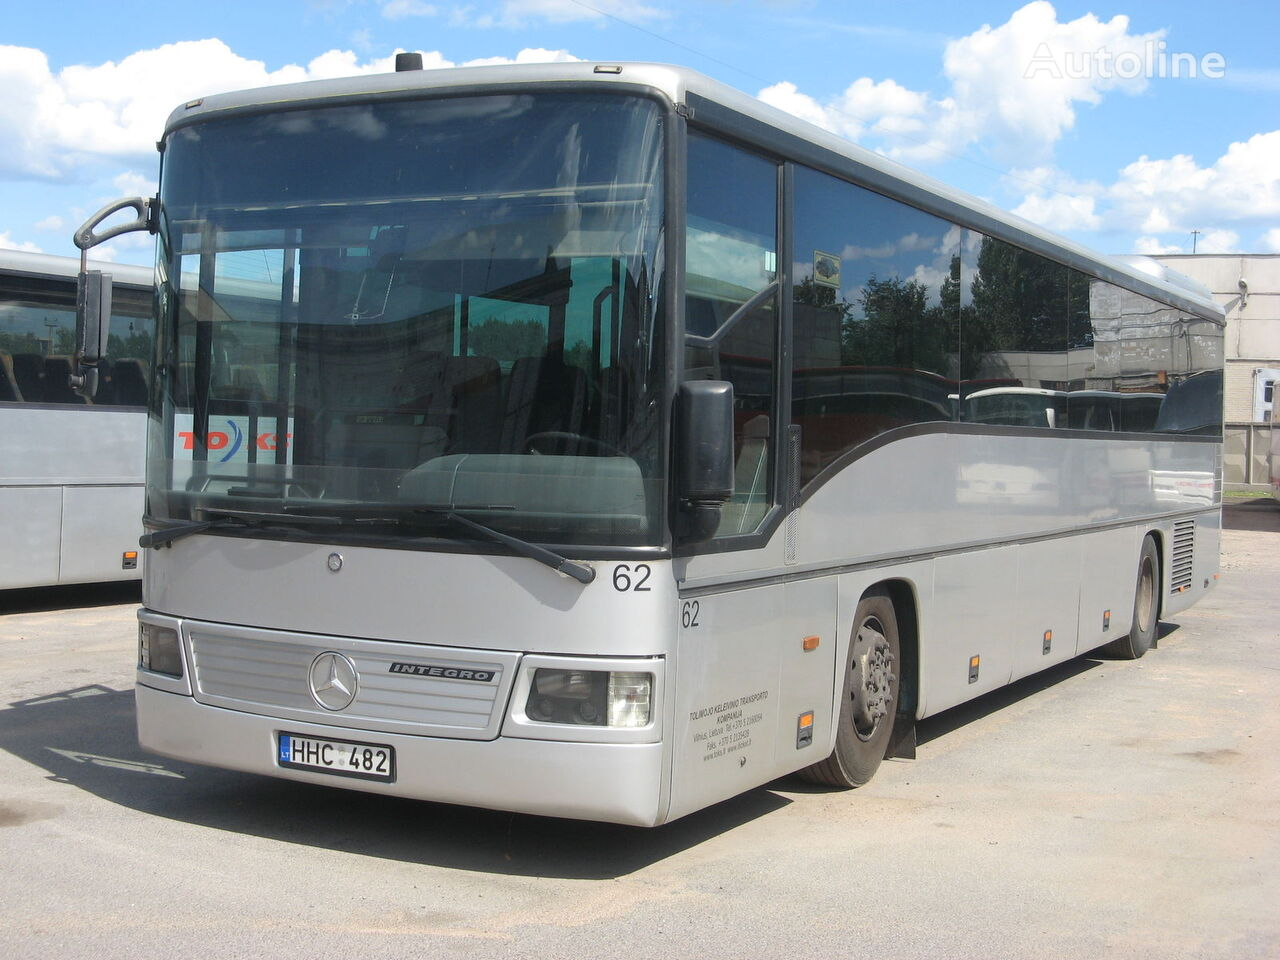 tarpmiestinis - priemiestinis autobusas MERCEDES-BENZ Integro